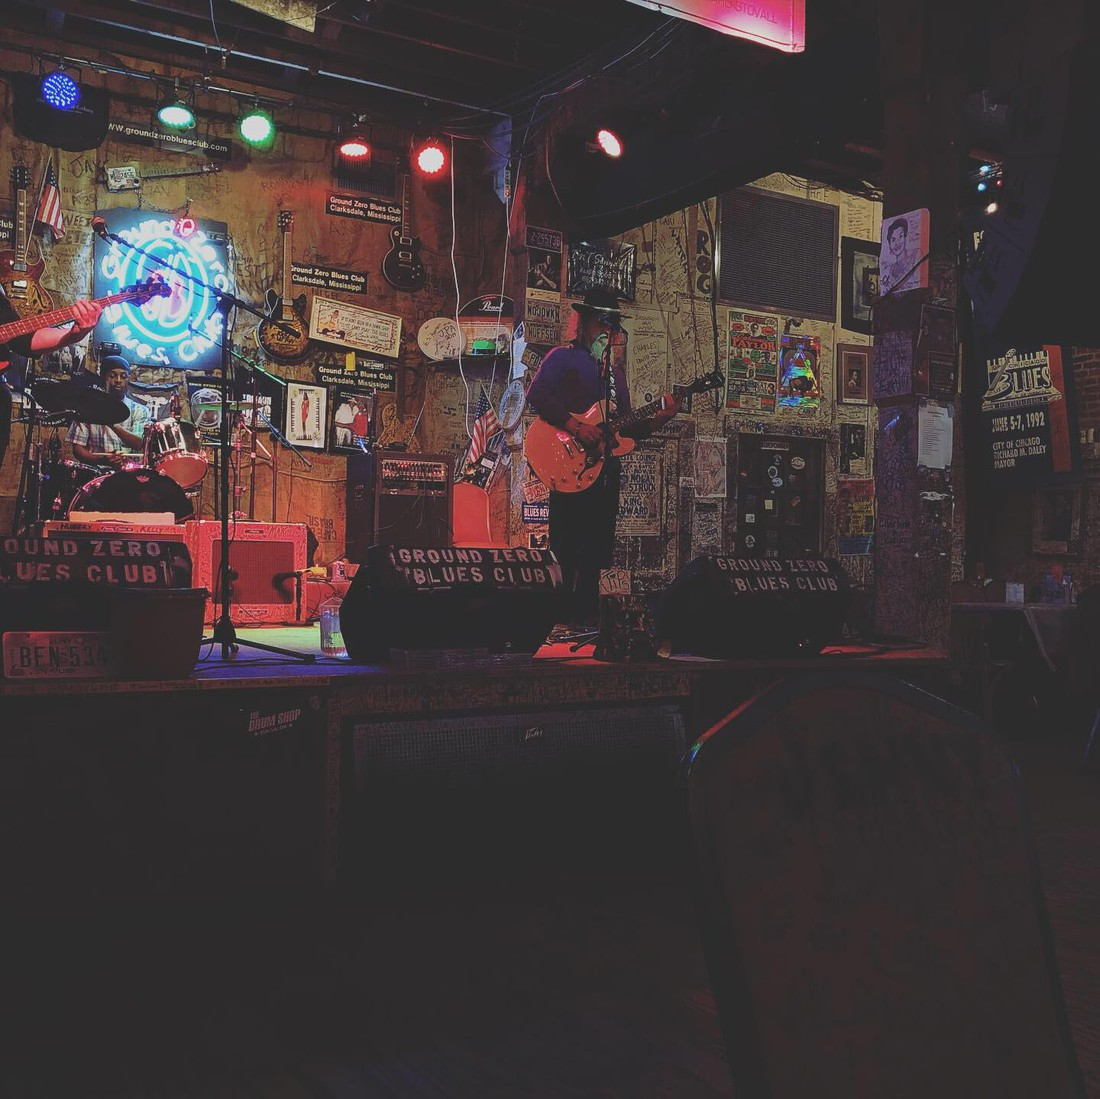 Ground Zero Blues Club - Clarksdale - Mississippi - Amerika - Doets Reizen